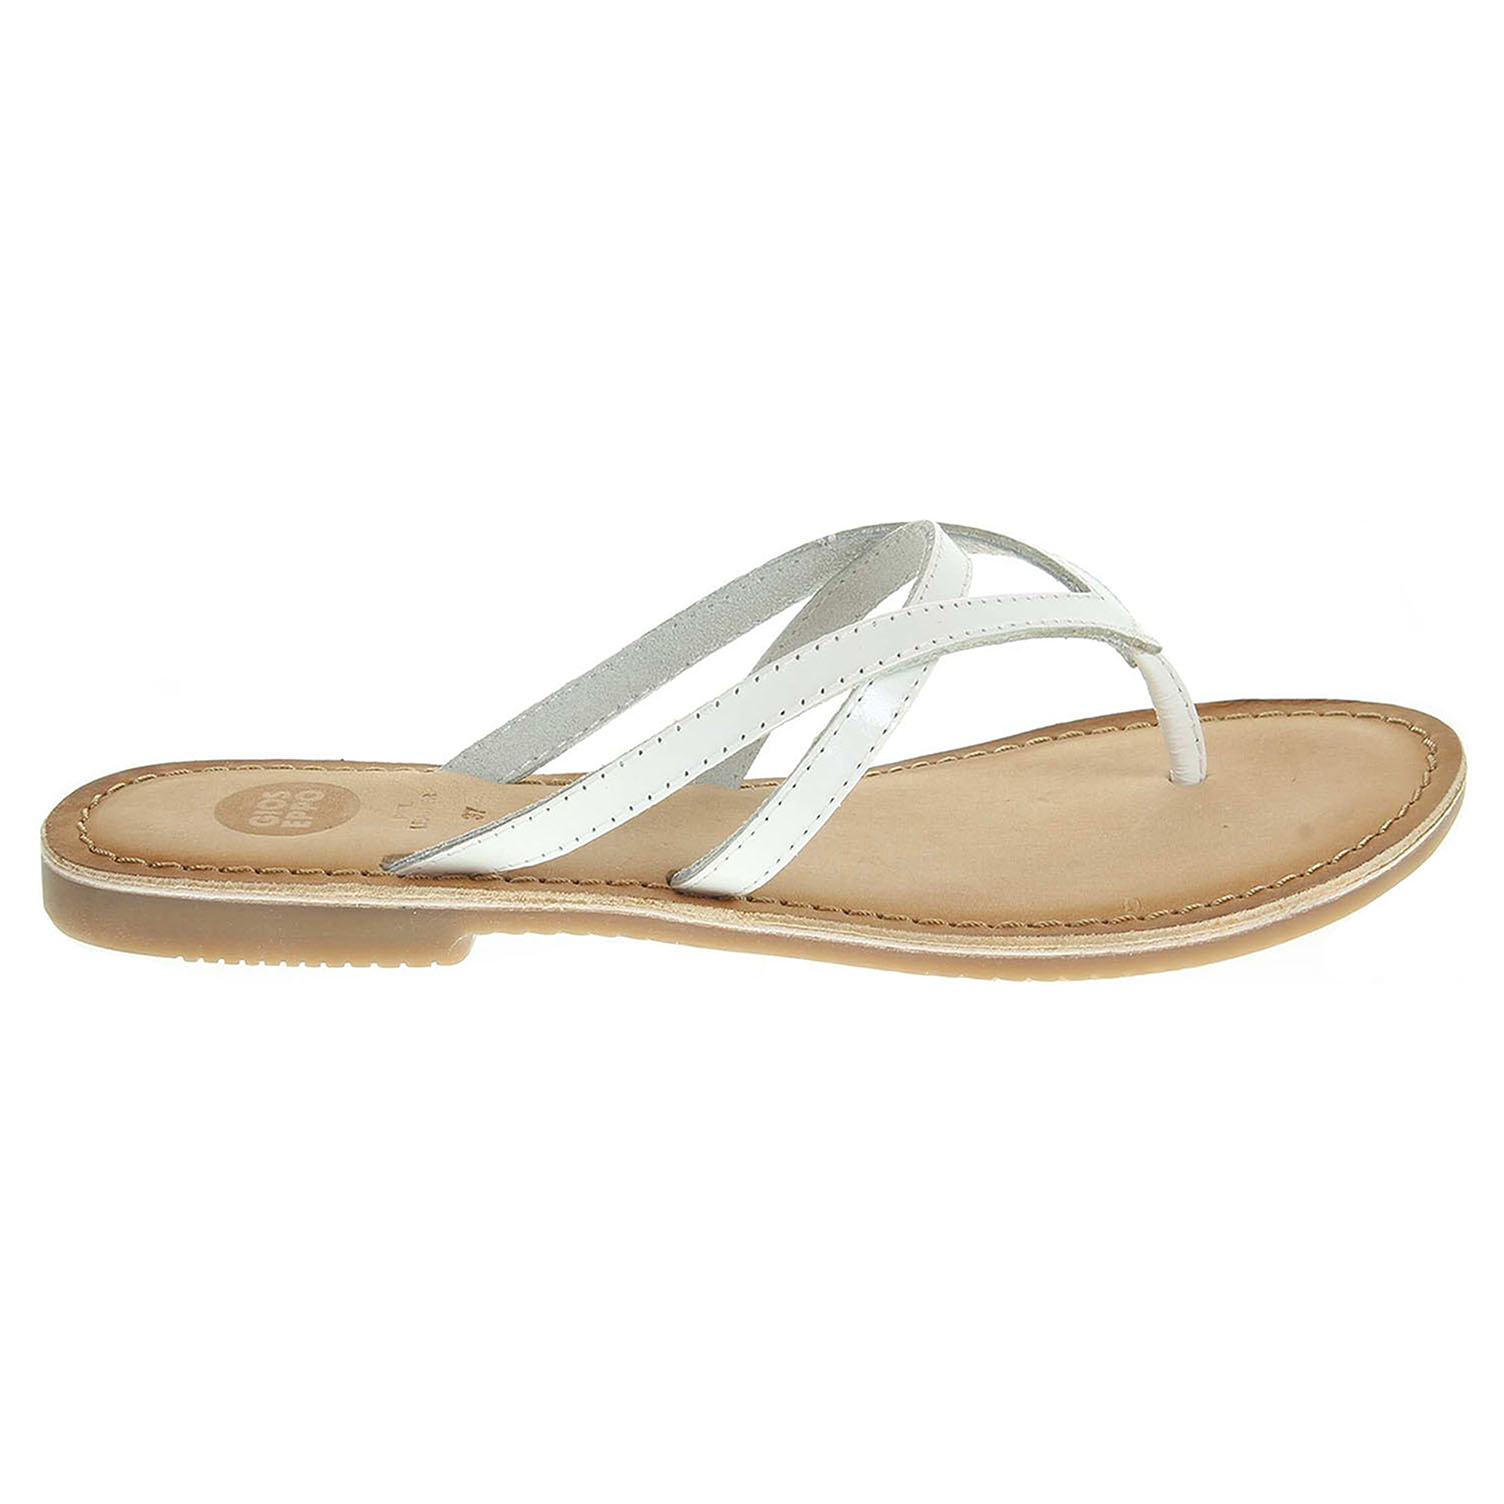 Gioseppo Miteva dámské pantofle bílé 41